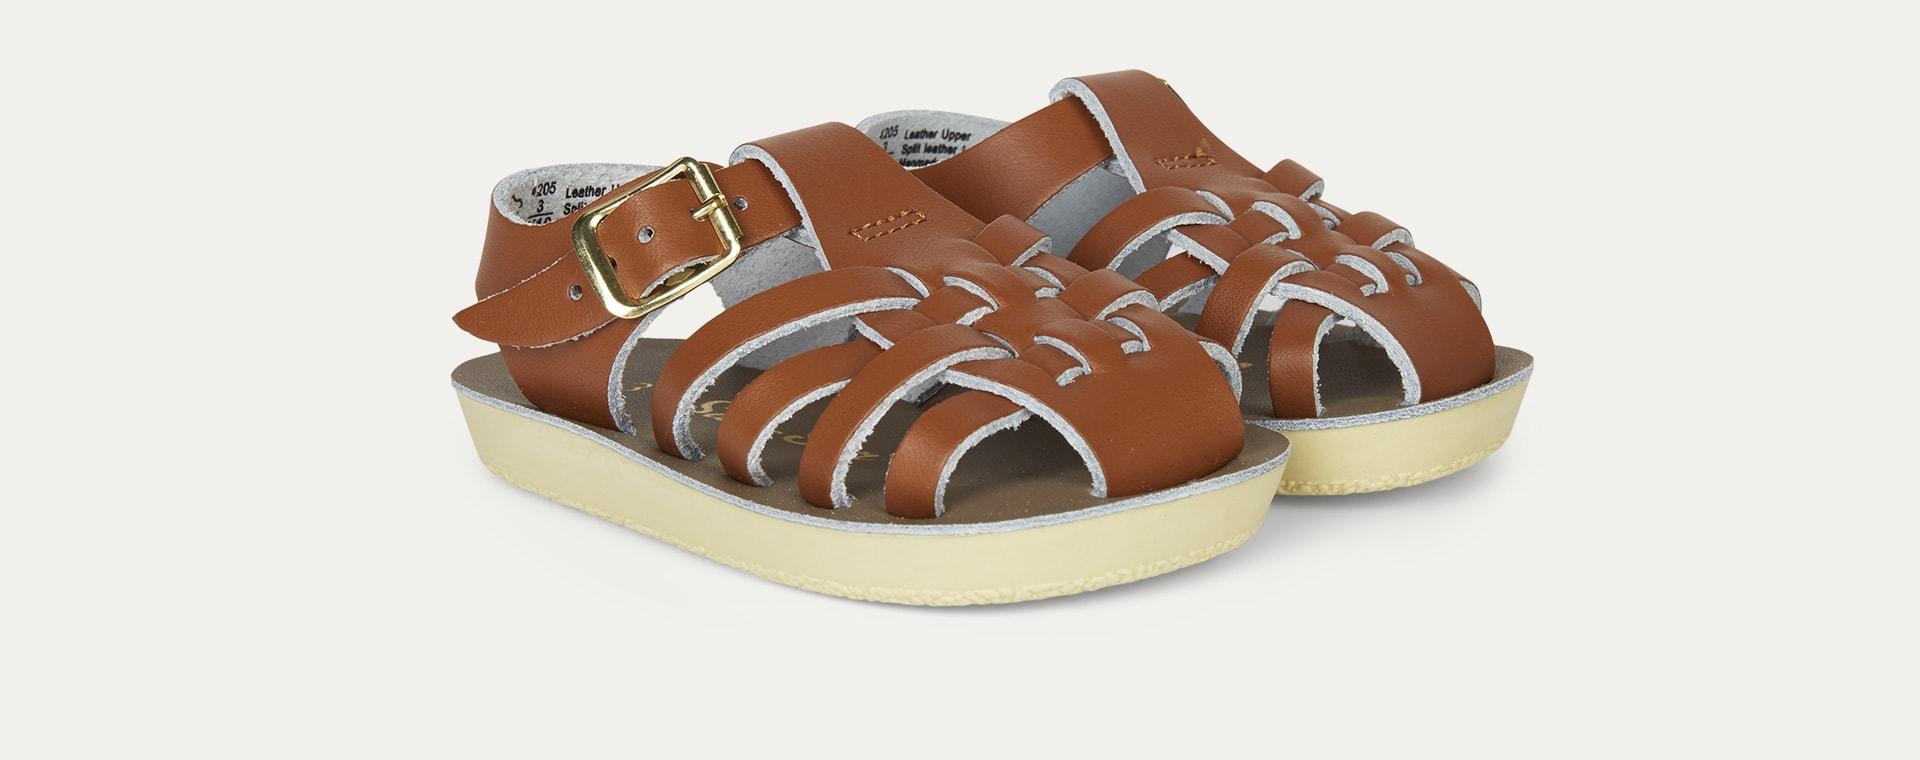 Tan Salt-Water Sandals Sailor Sandal